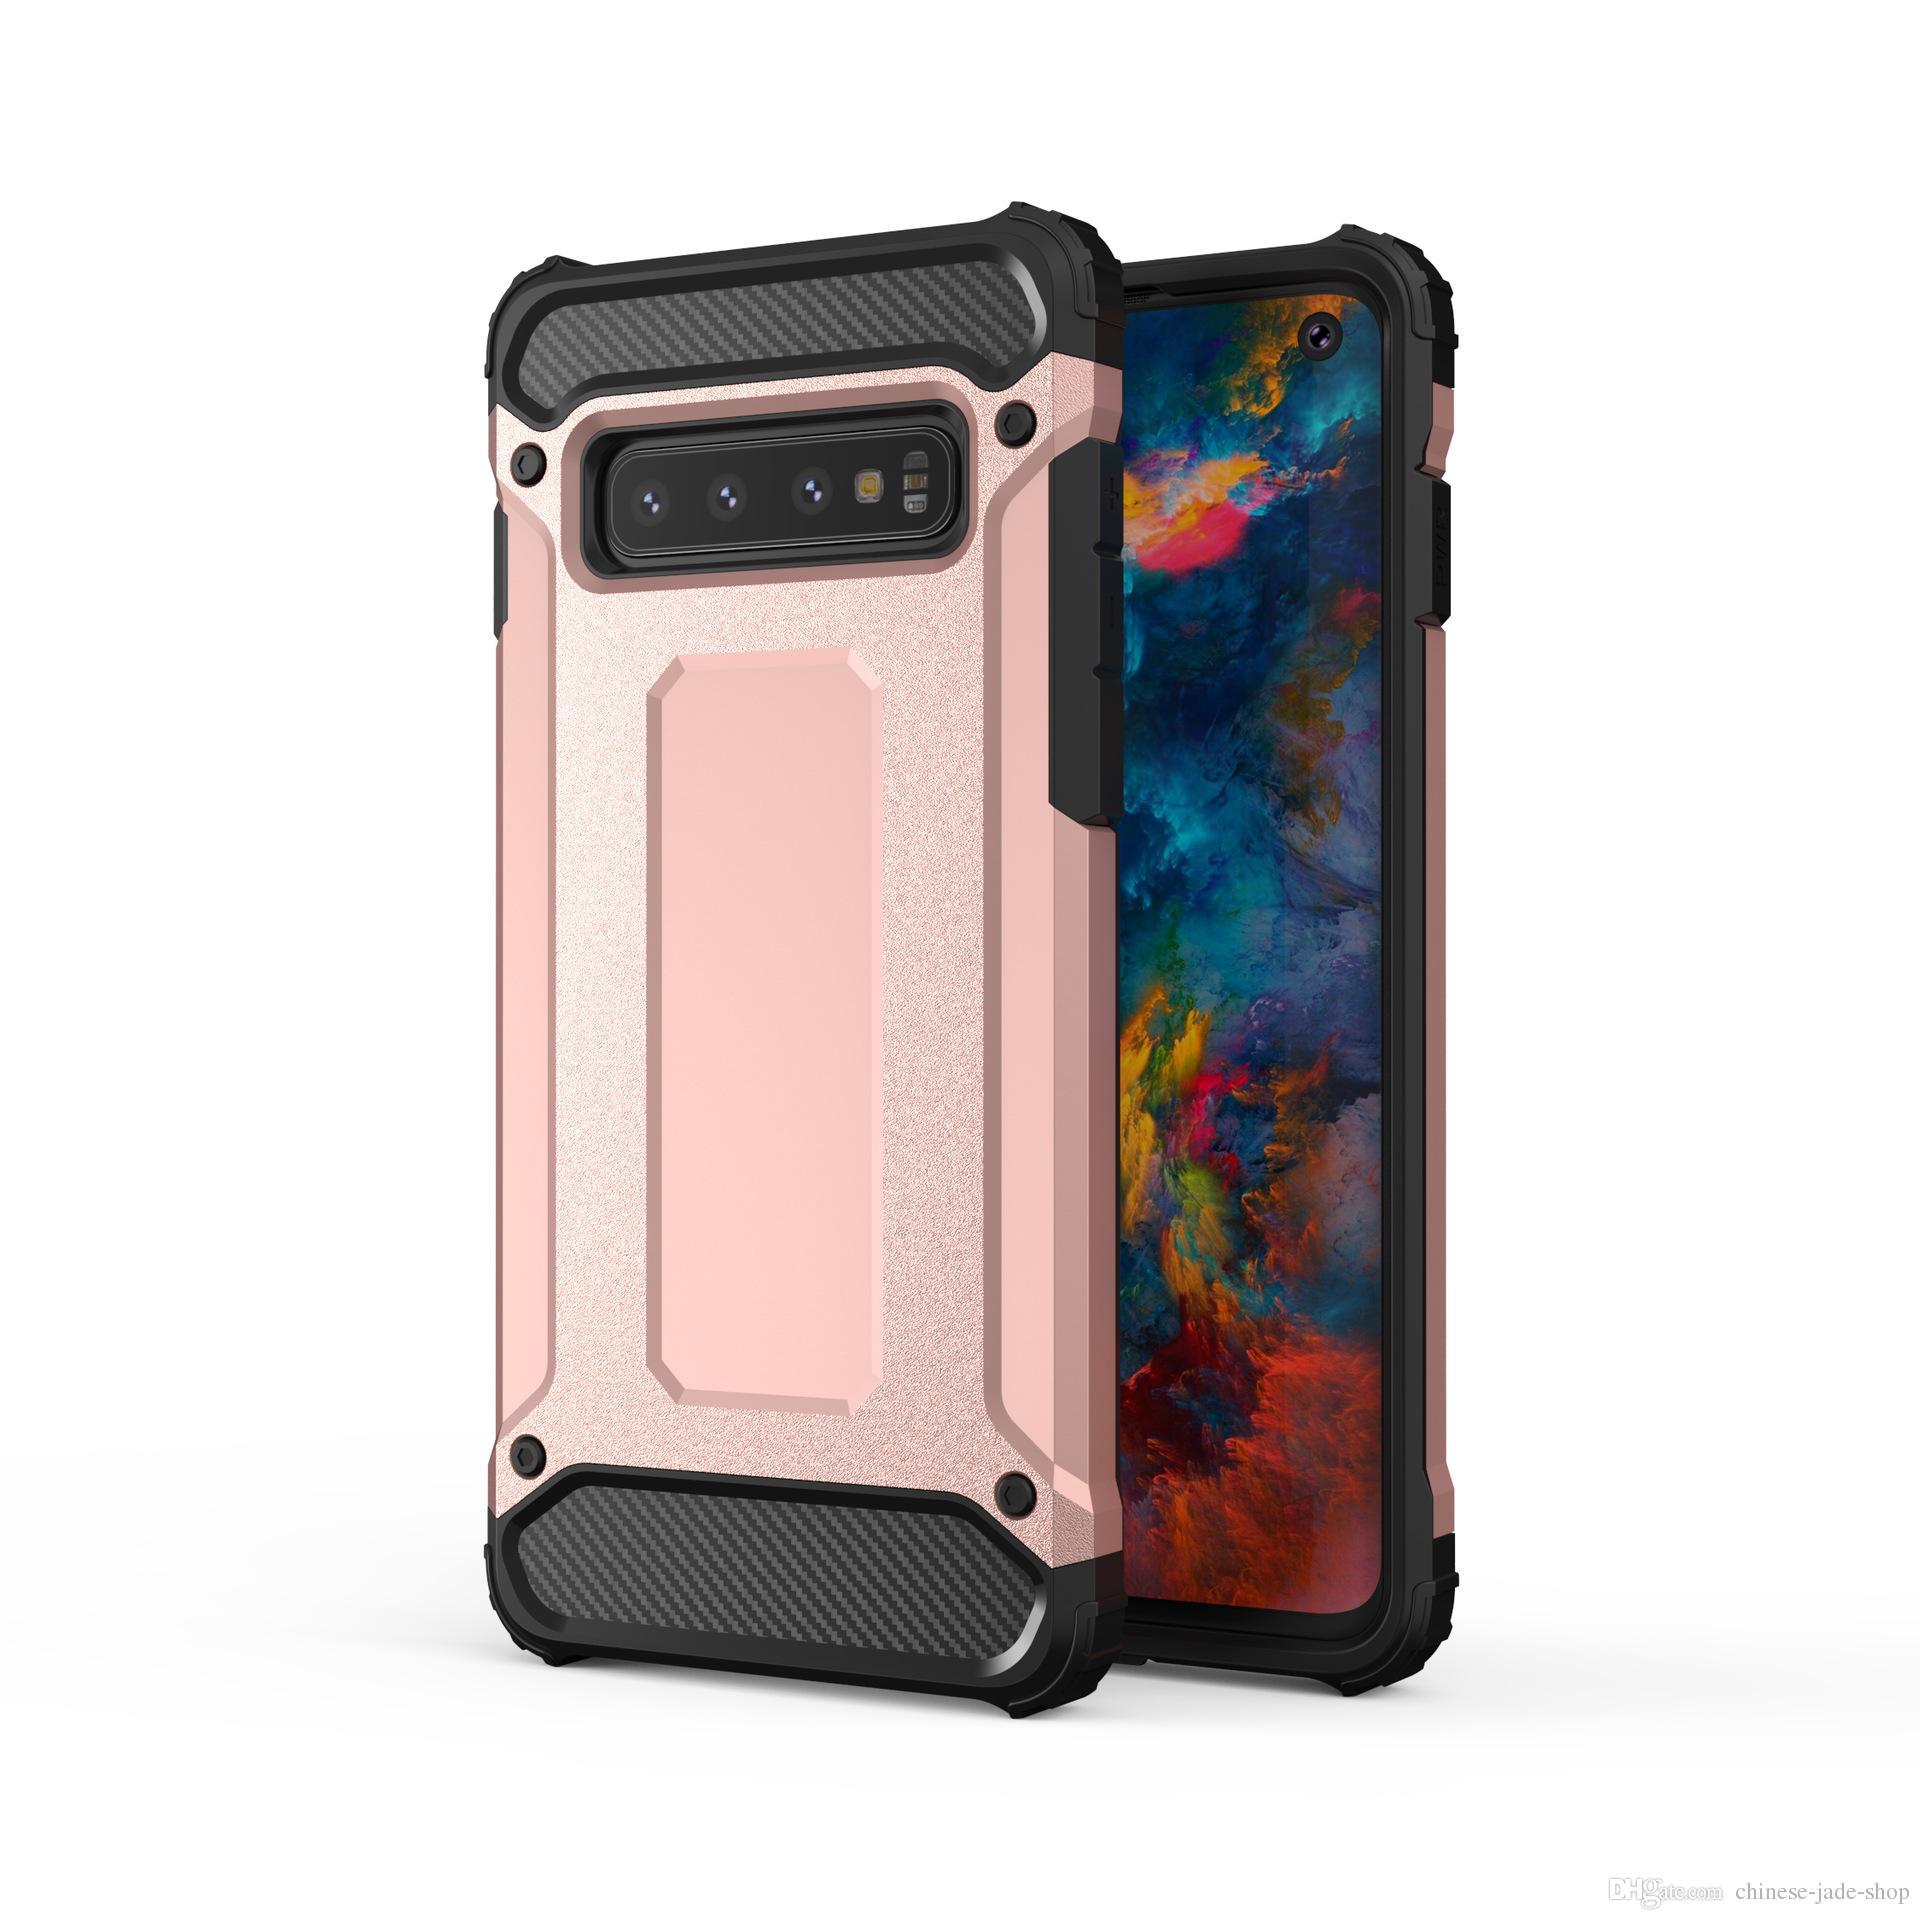 Armor Hybrid Defender Case TPU + PC Shockproof Cover voor Samsung Galaxy S10 S10 Plue S10E A10 A20 A30 A50 M10 M20 M30 220PCS / LOT